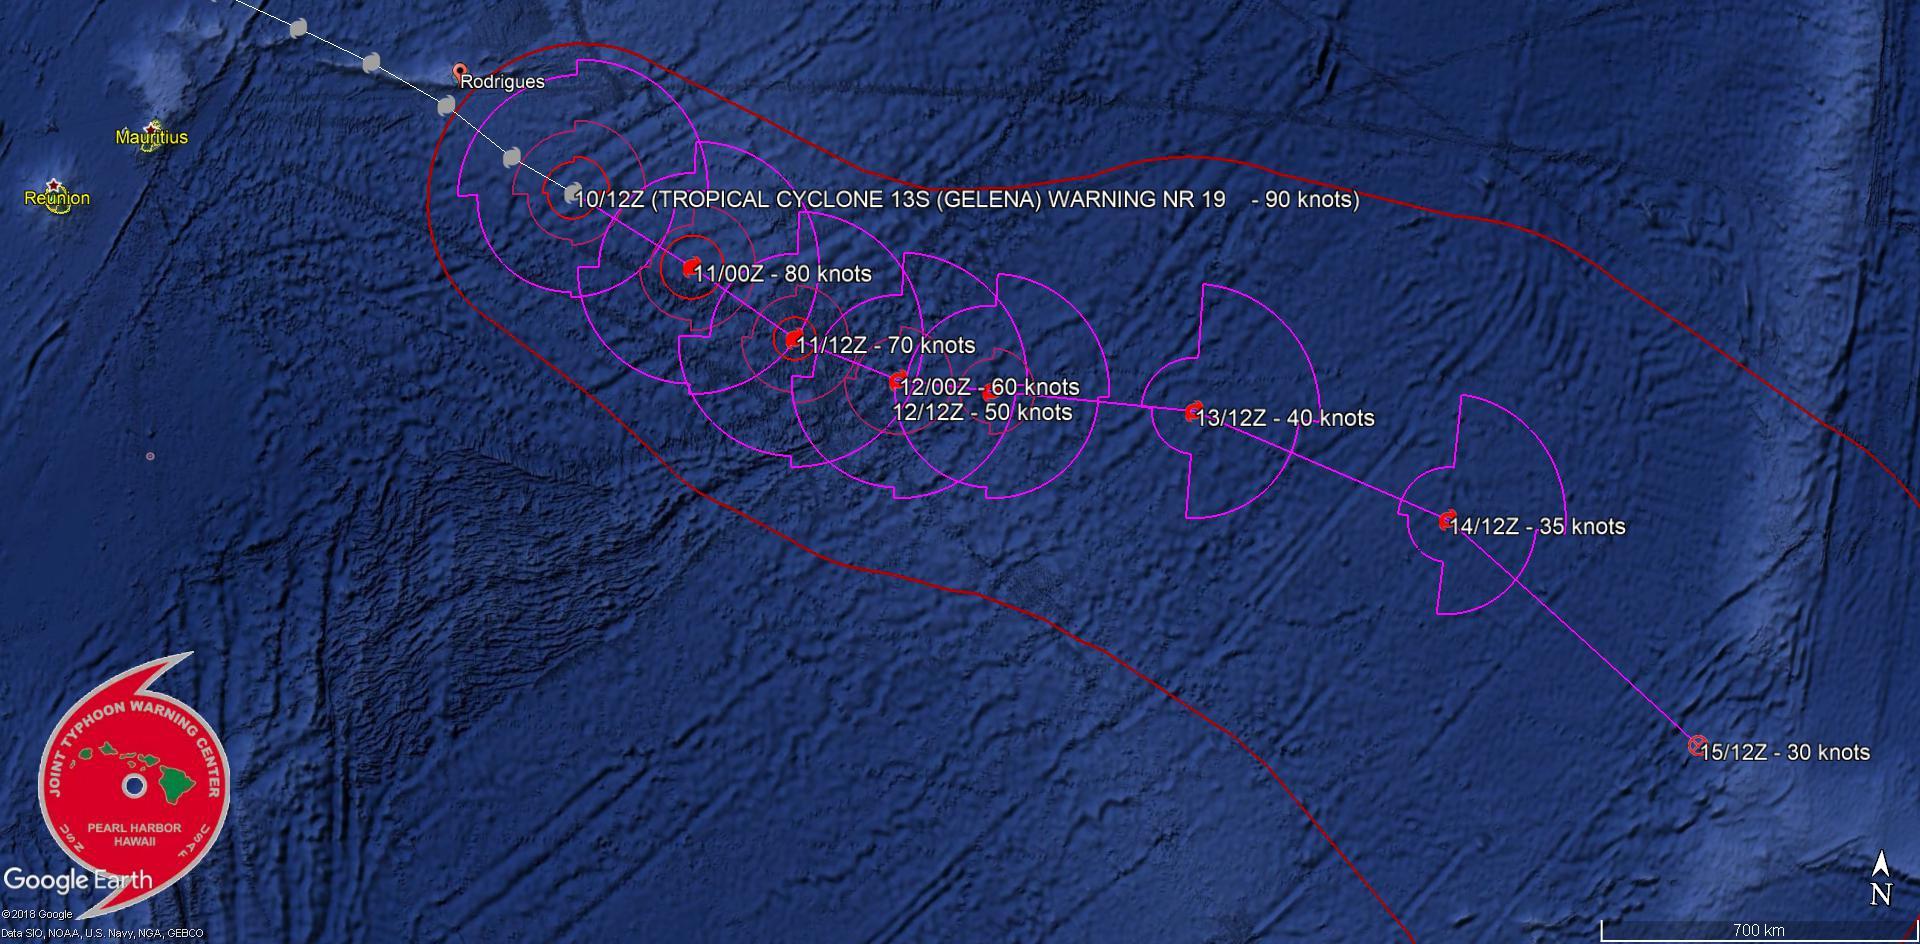 JTWC: le cyclone s'éloigne de Rodrigues.